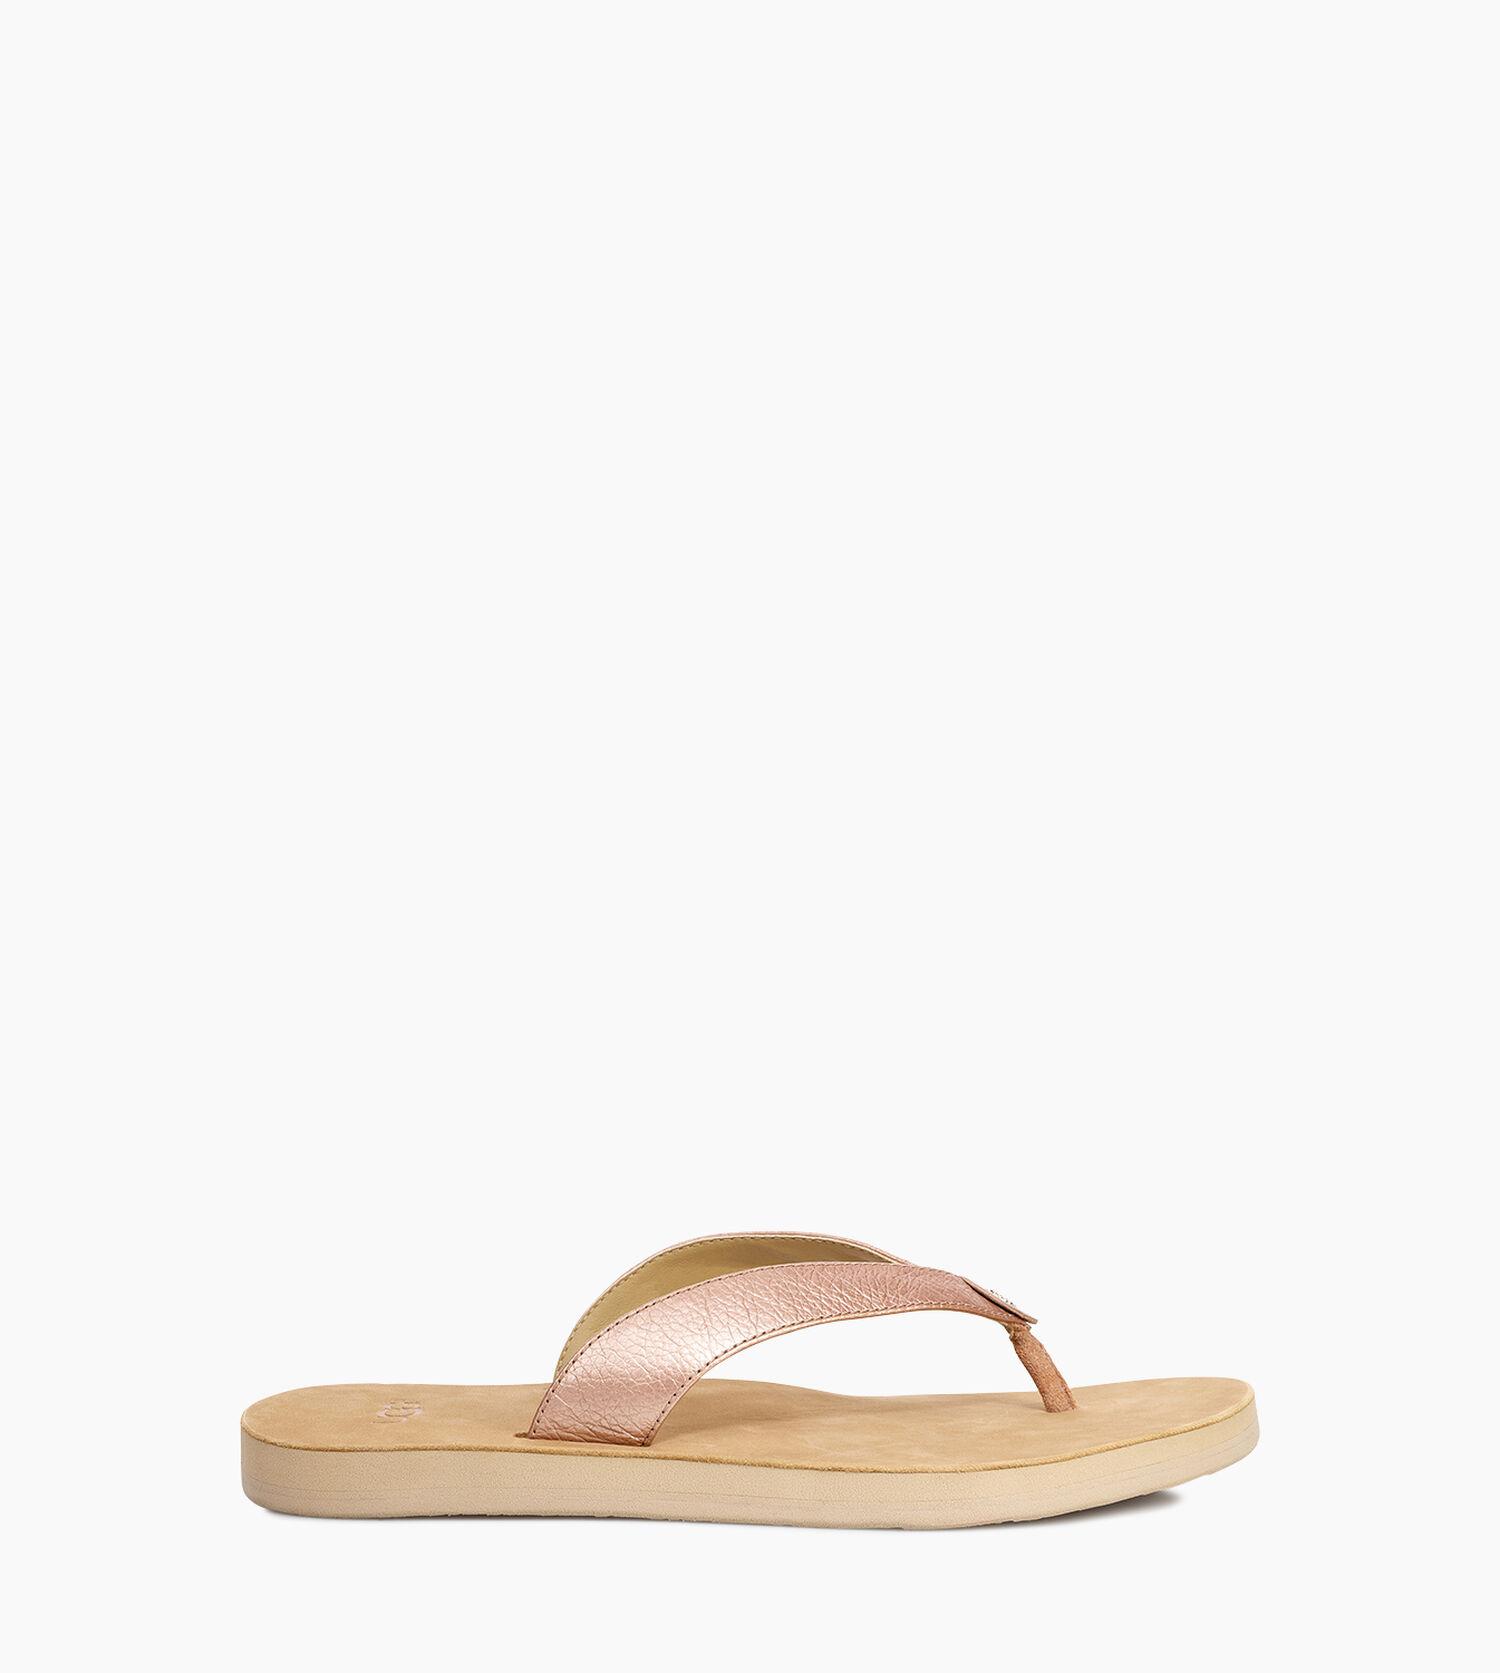 7d7983e6017dab Zoom Tawney Metallic Sandal - Image 1 of 6